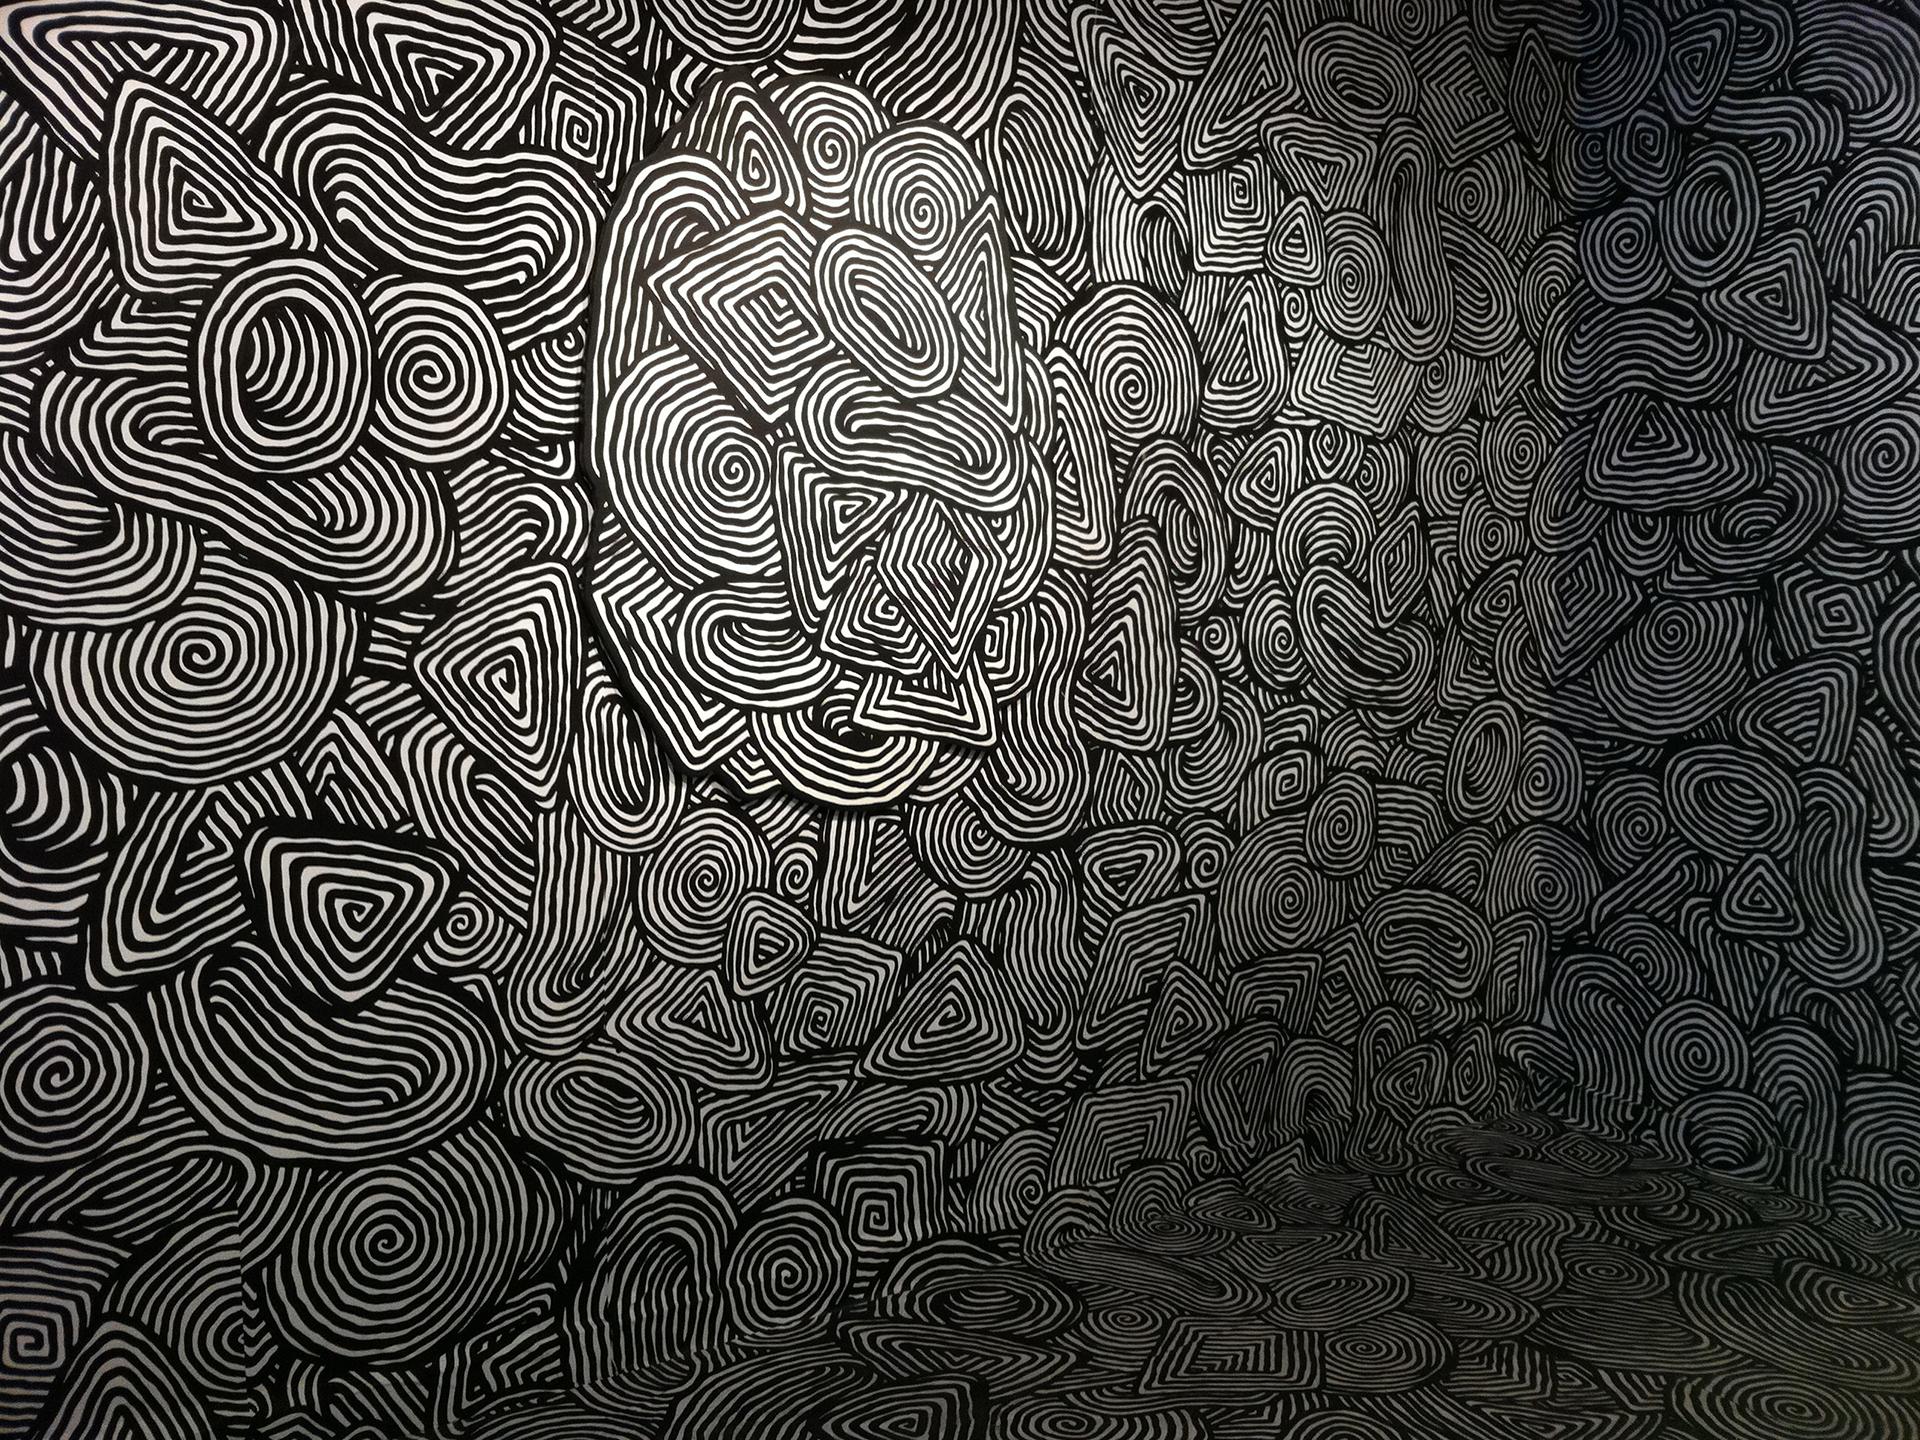 Spiral Black White Design Wallpaper 1920x1440 Full HD Wallpapers 1920x1440